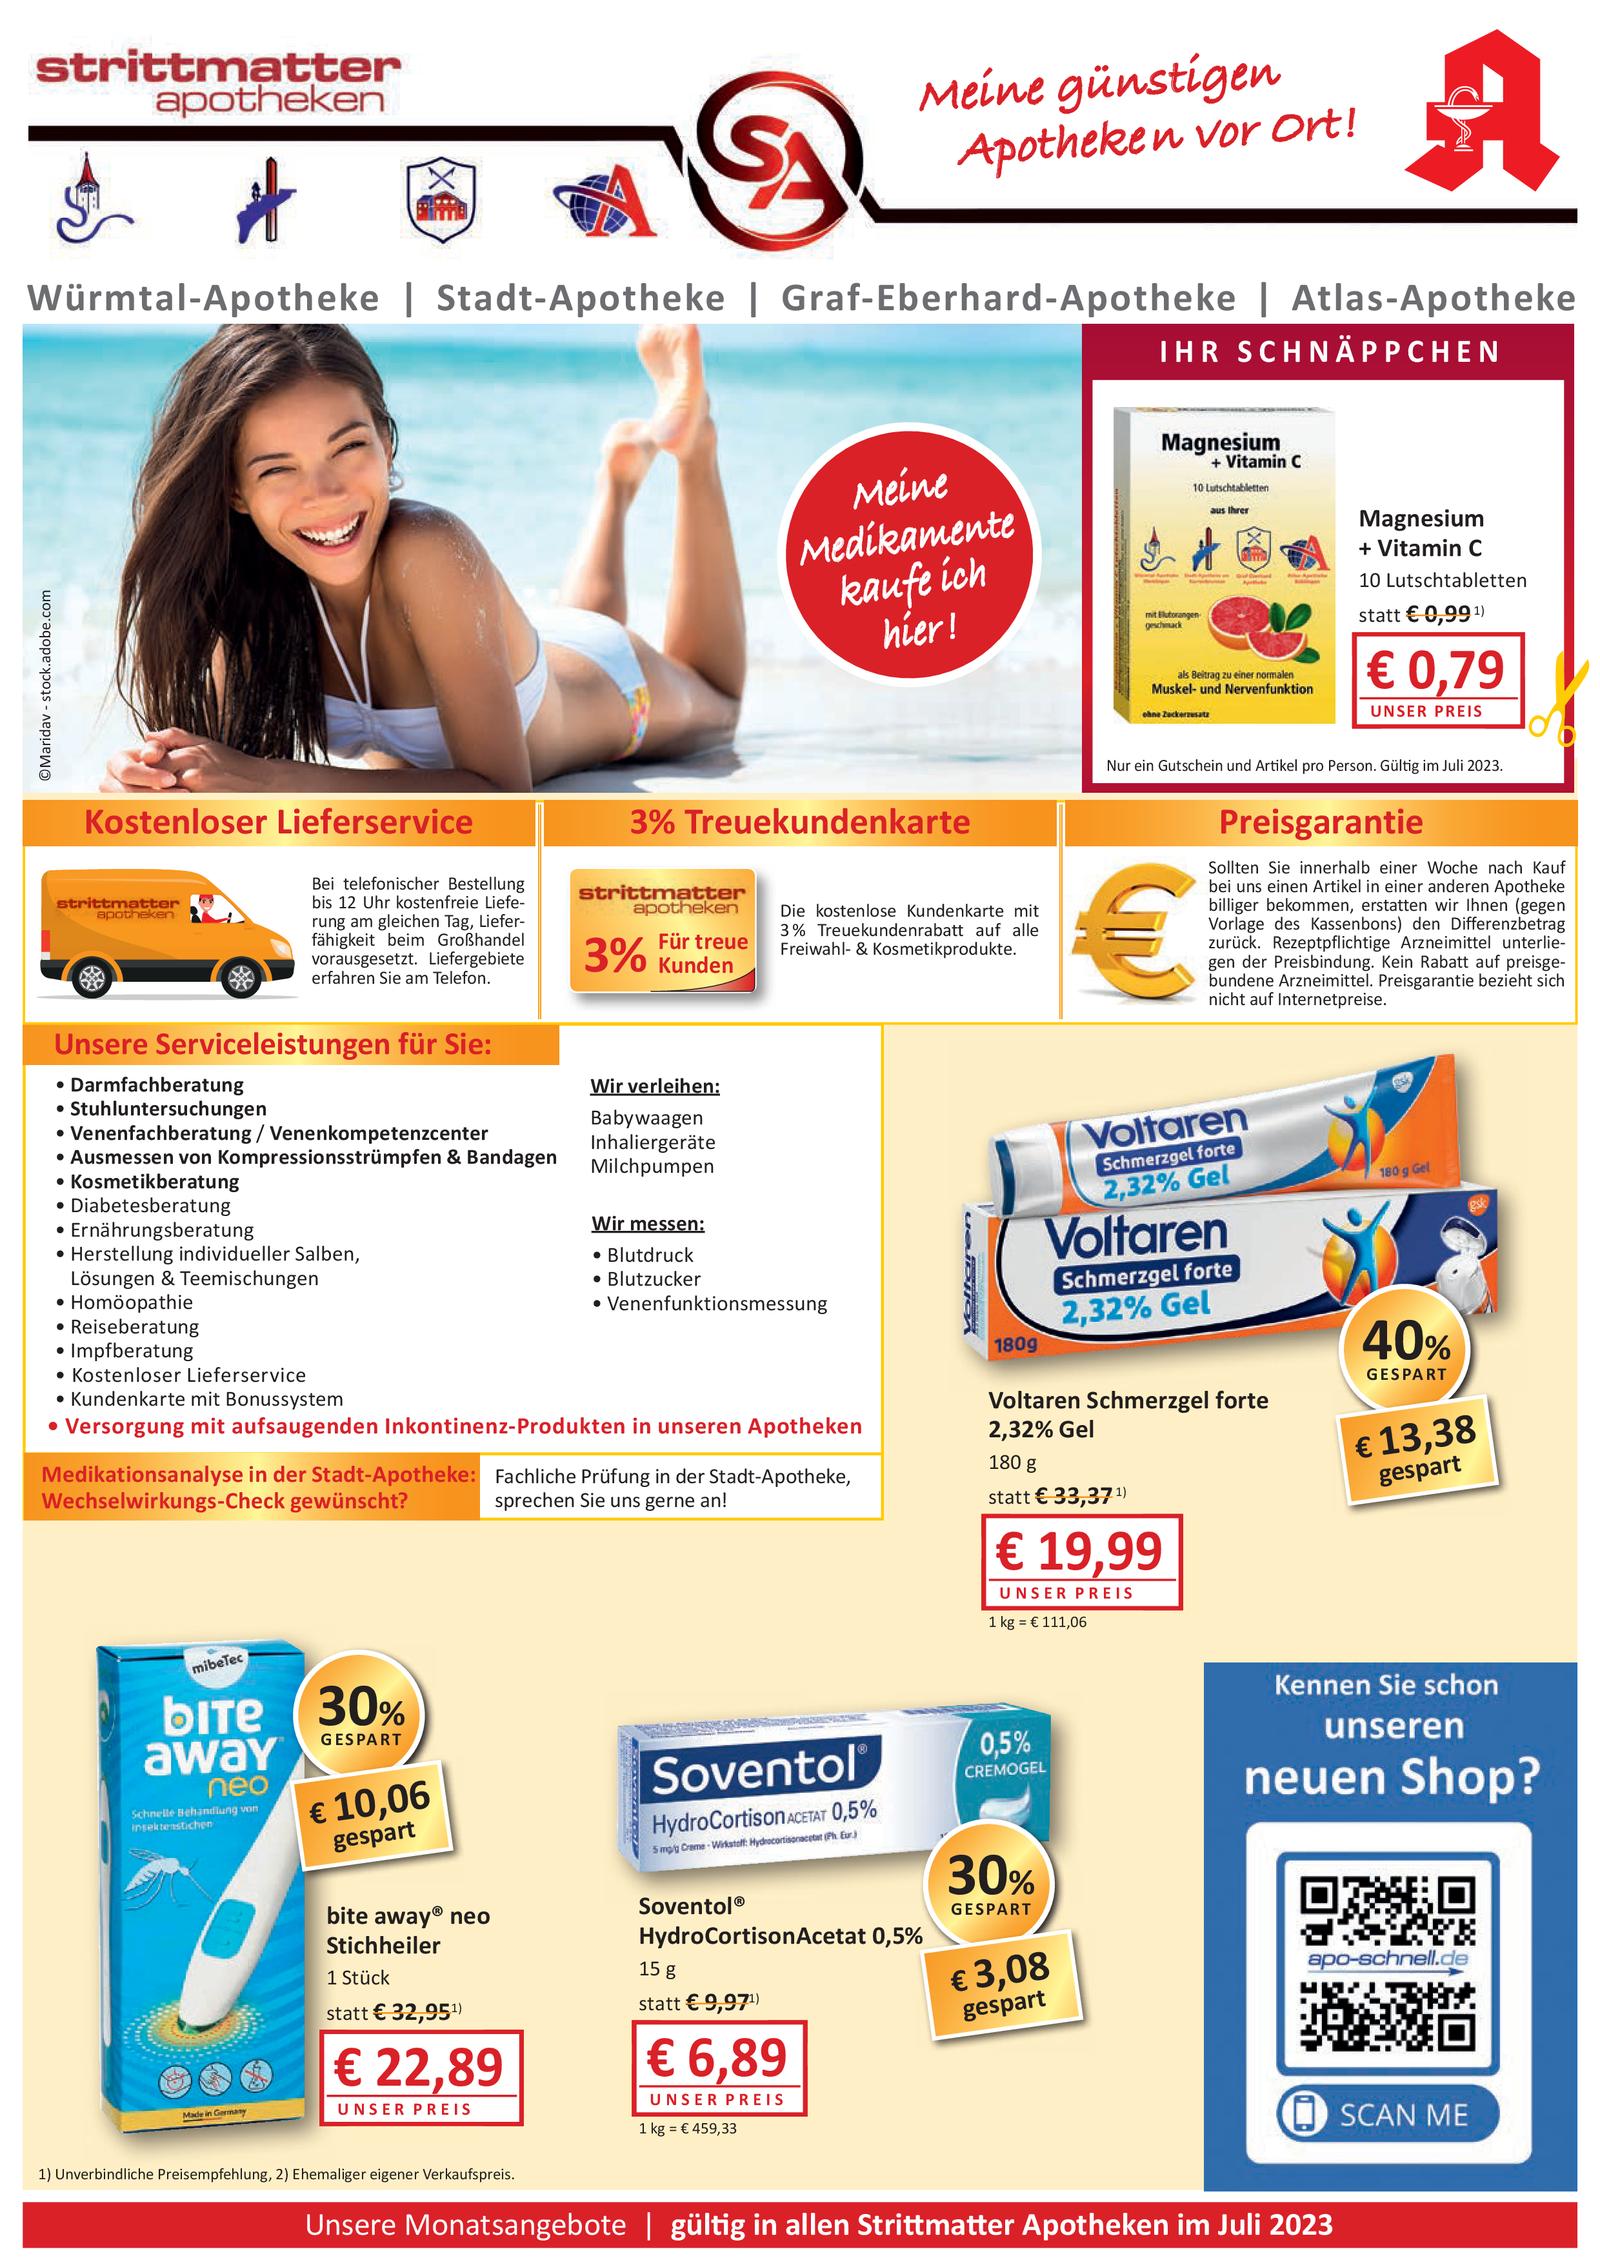 https://mein-uploads.apocdn.net/32390/leaflets/32390_flyer-Seite1.png